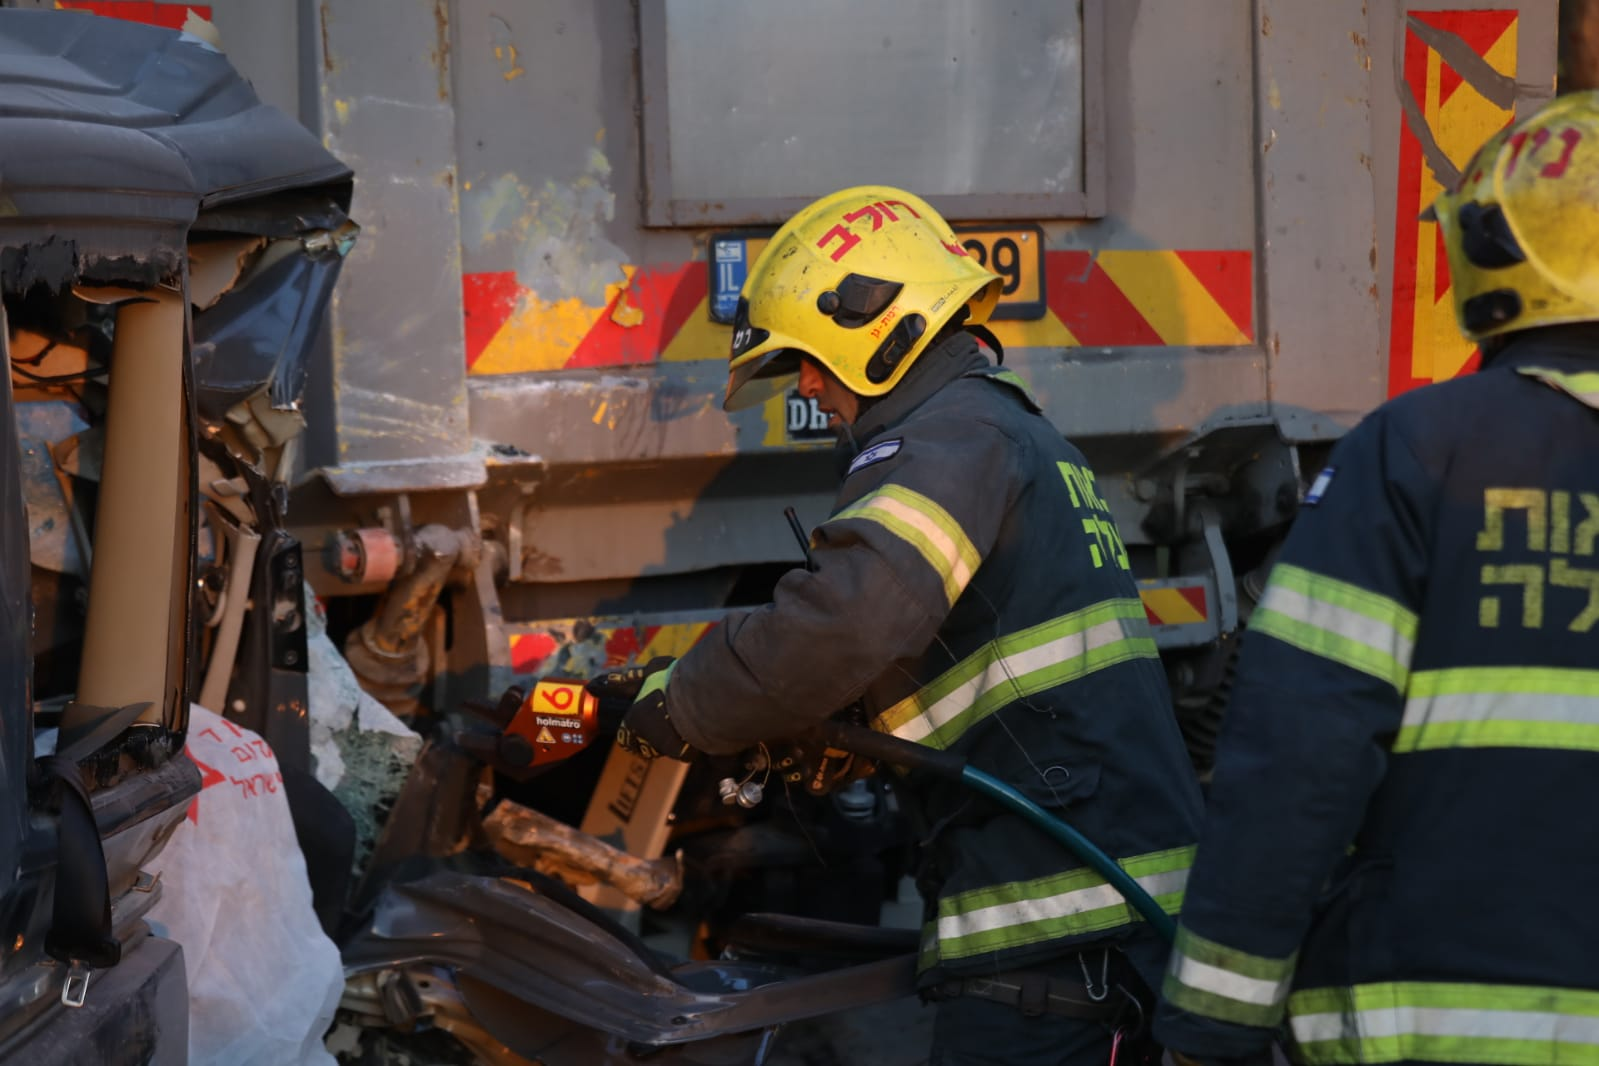 "Photo of תאונה קטלנית קשה באלוף שדה בר""ג: 2 הרוגים, 2 פצועים אנוש, 4 פצועים נוספים בהתנגשות משאית במיניבוס. לוחמי האש נאלצו לחלץ את הנפגעים שנותרו לכודים"